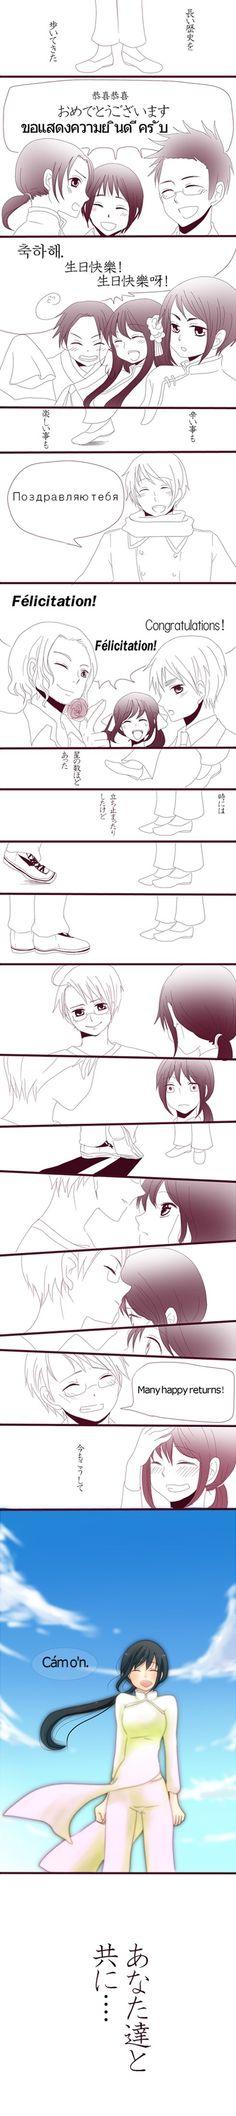 "She said:""Cảm ơn"" In English it means ""Thank u"".she's so cute~"